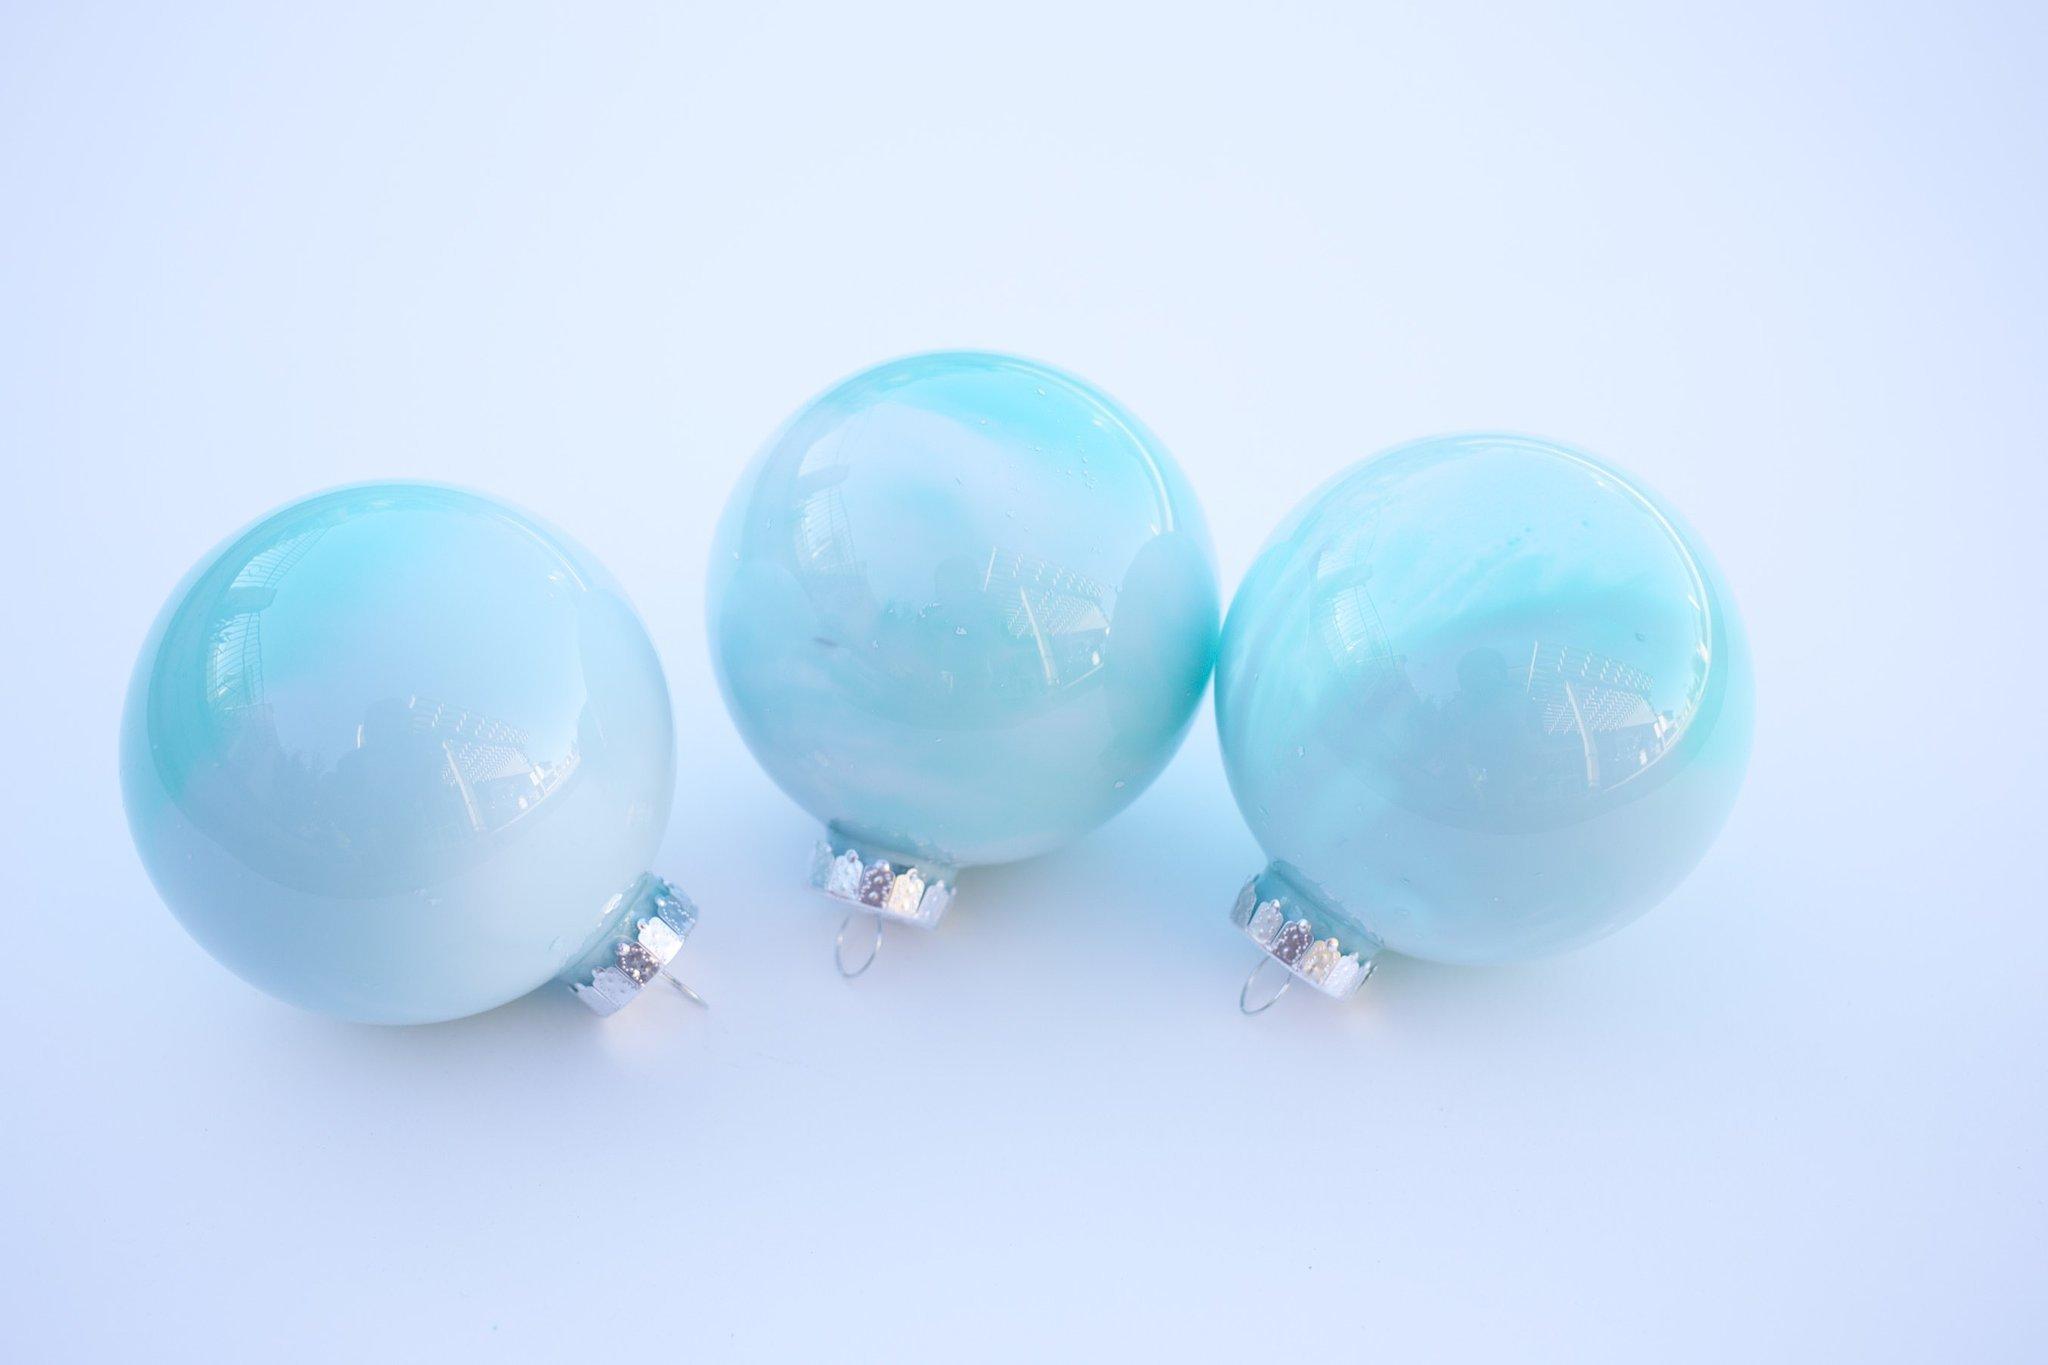 DIY delicate ombre Christmas ornaments